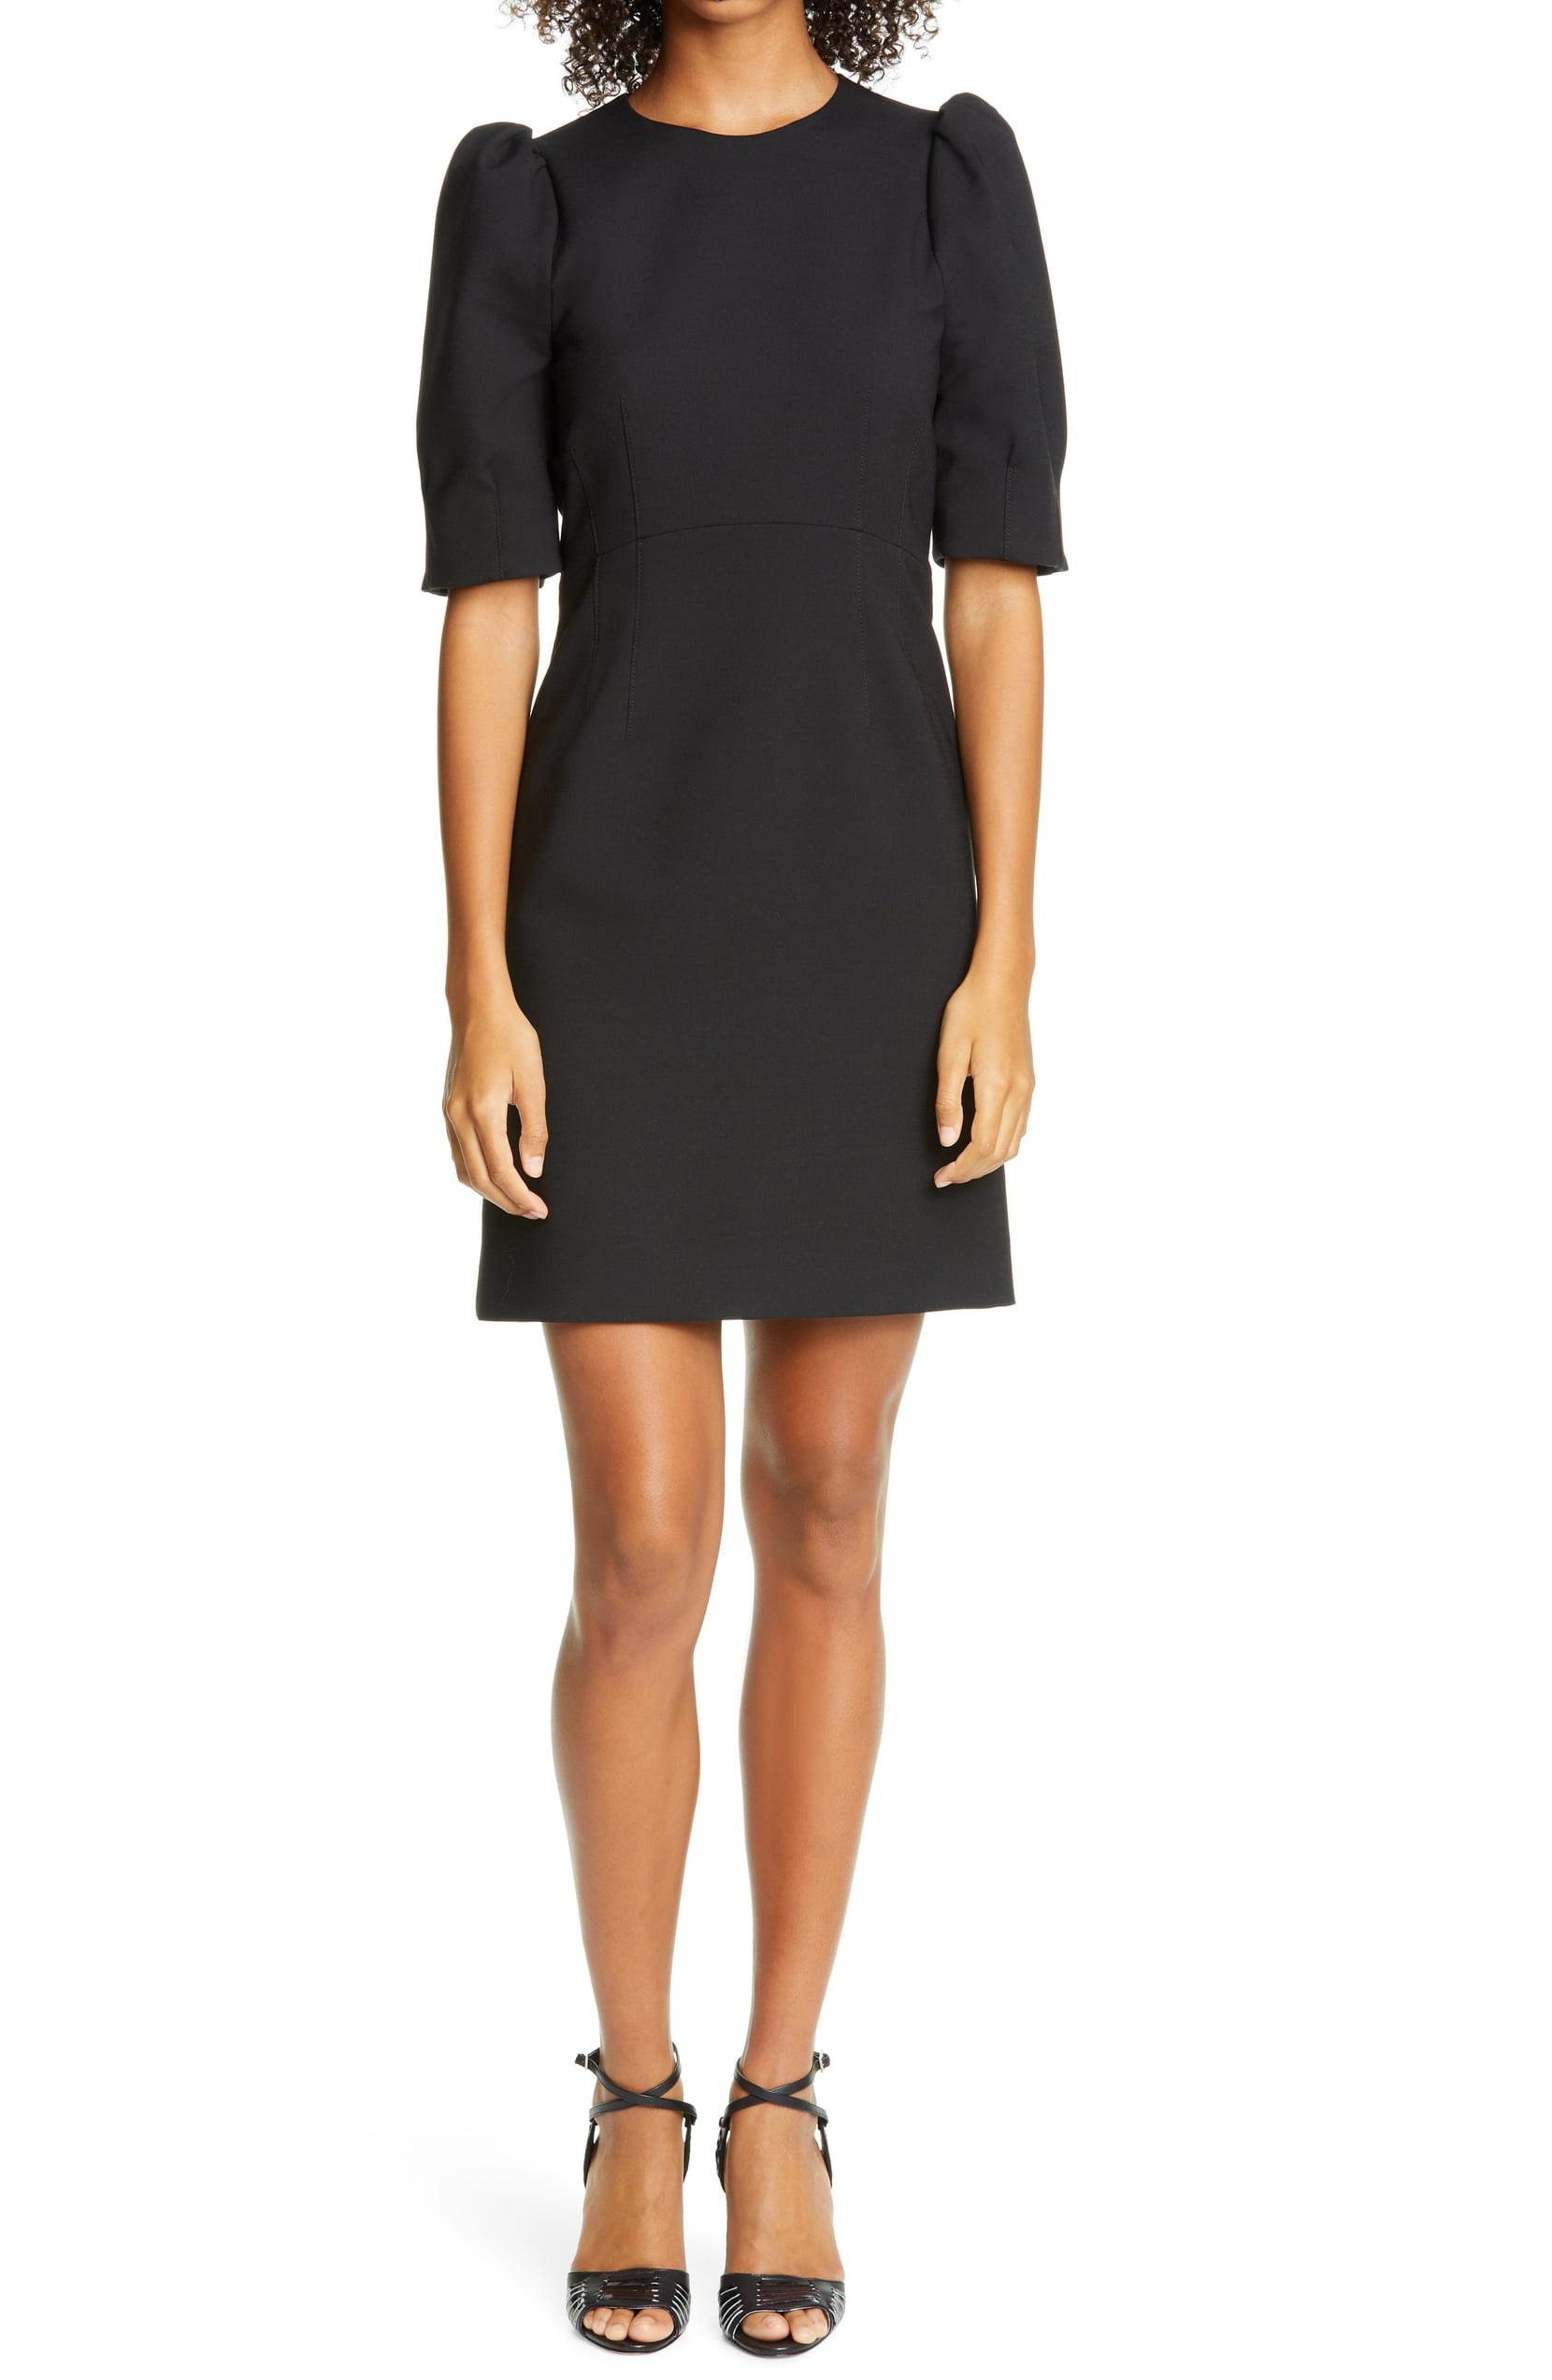 A model wearing the Veronica Beard Meadow Puff Sleeve Minidress.